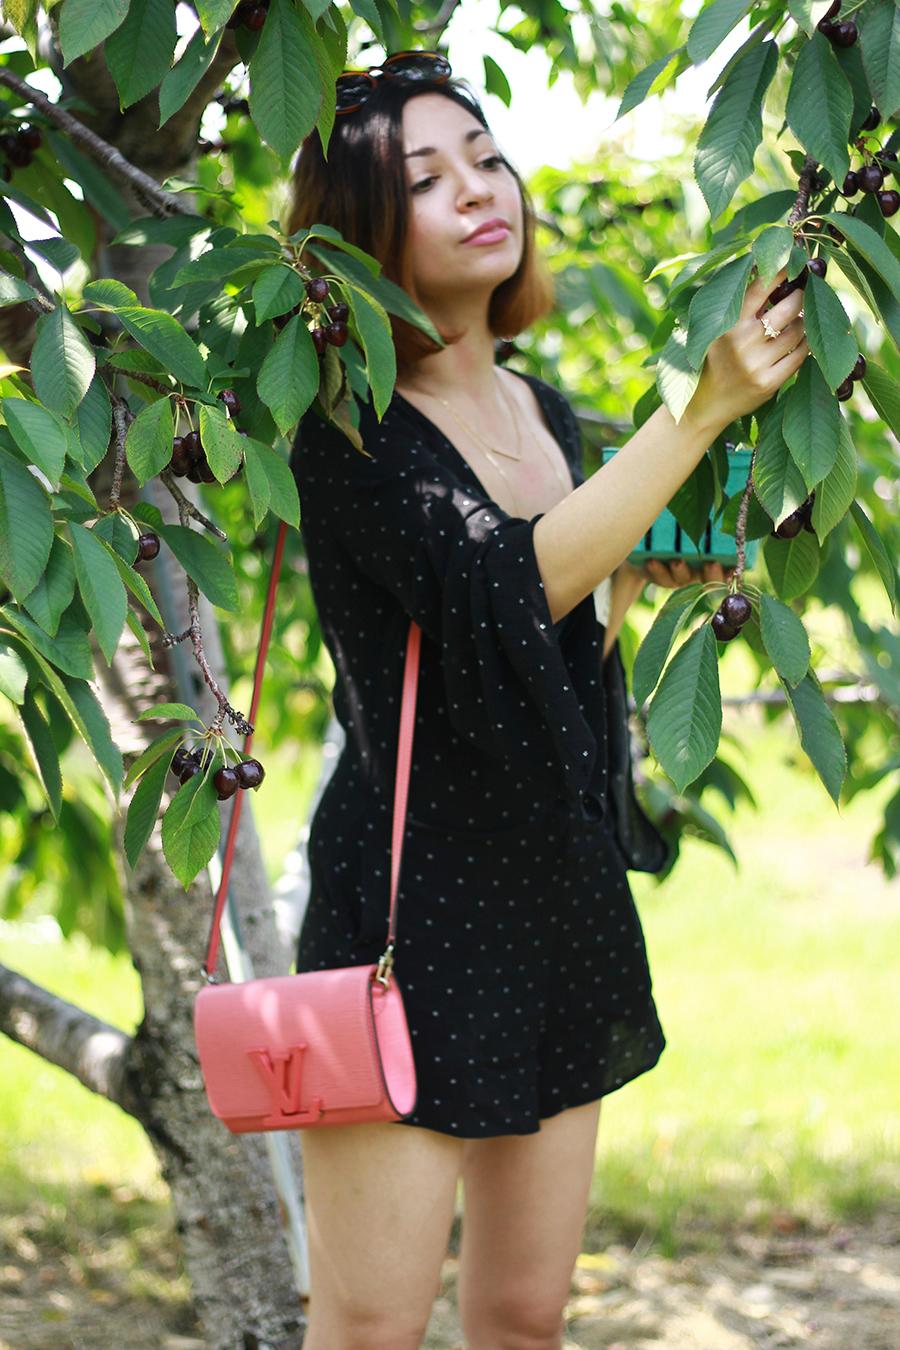 westview-orchards-cherry-picking-michigan11